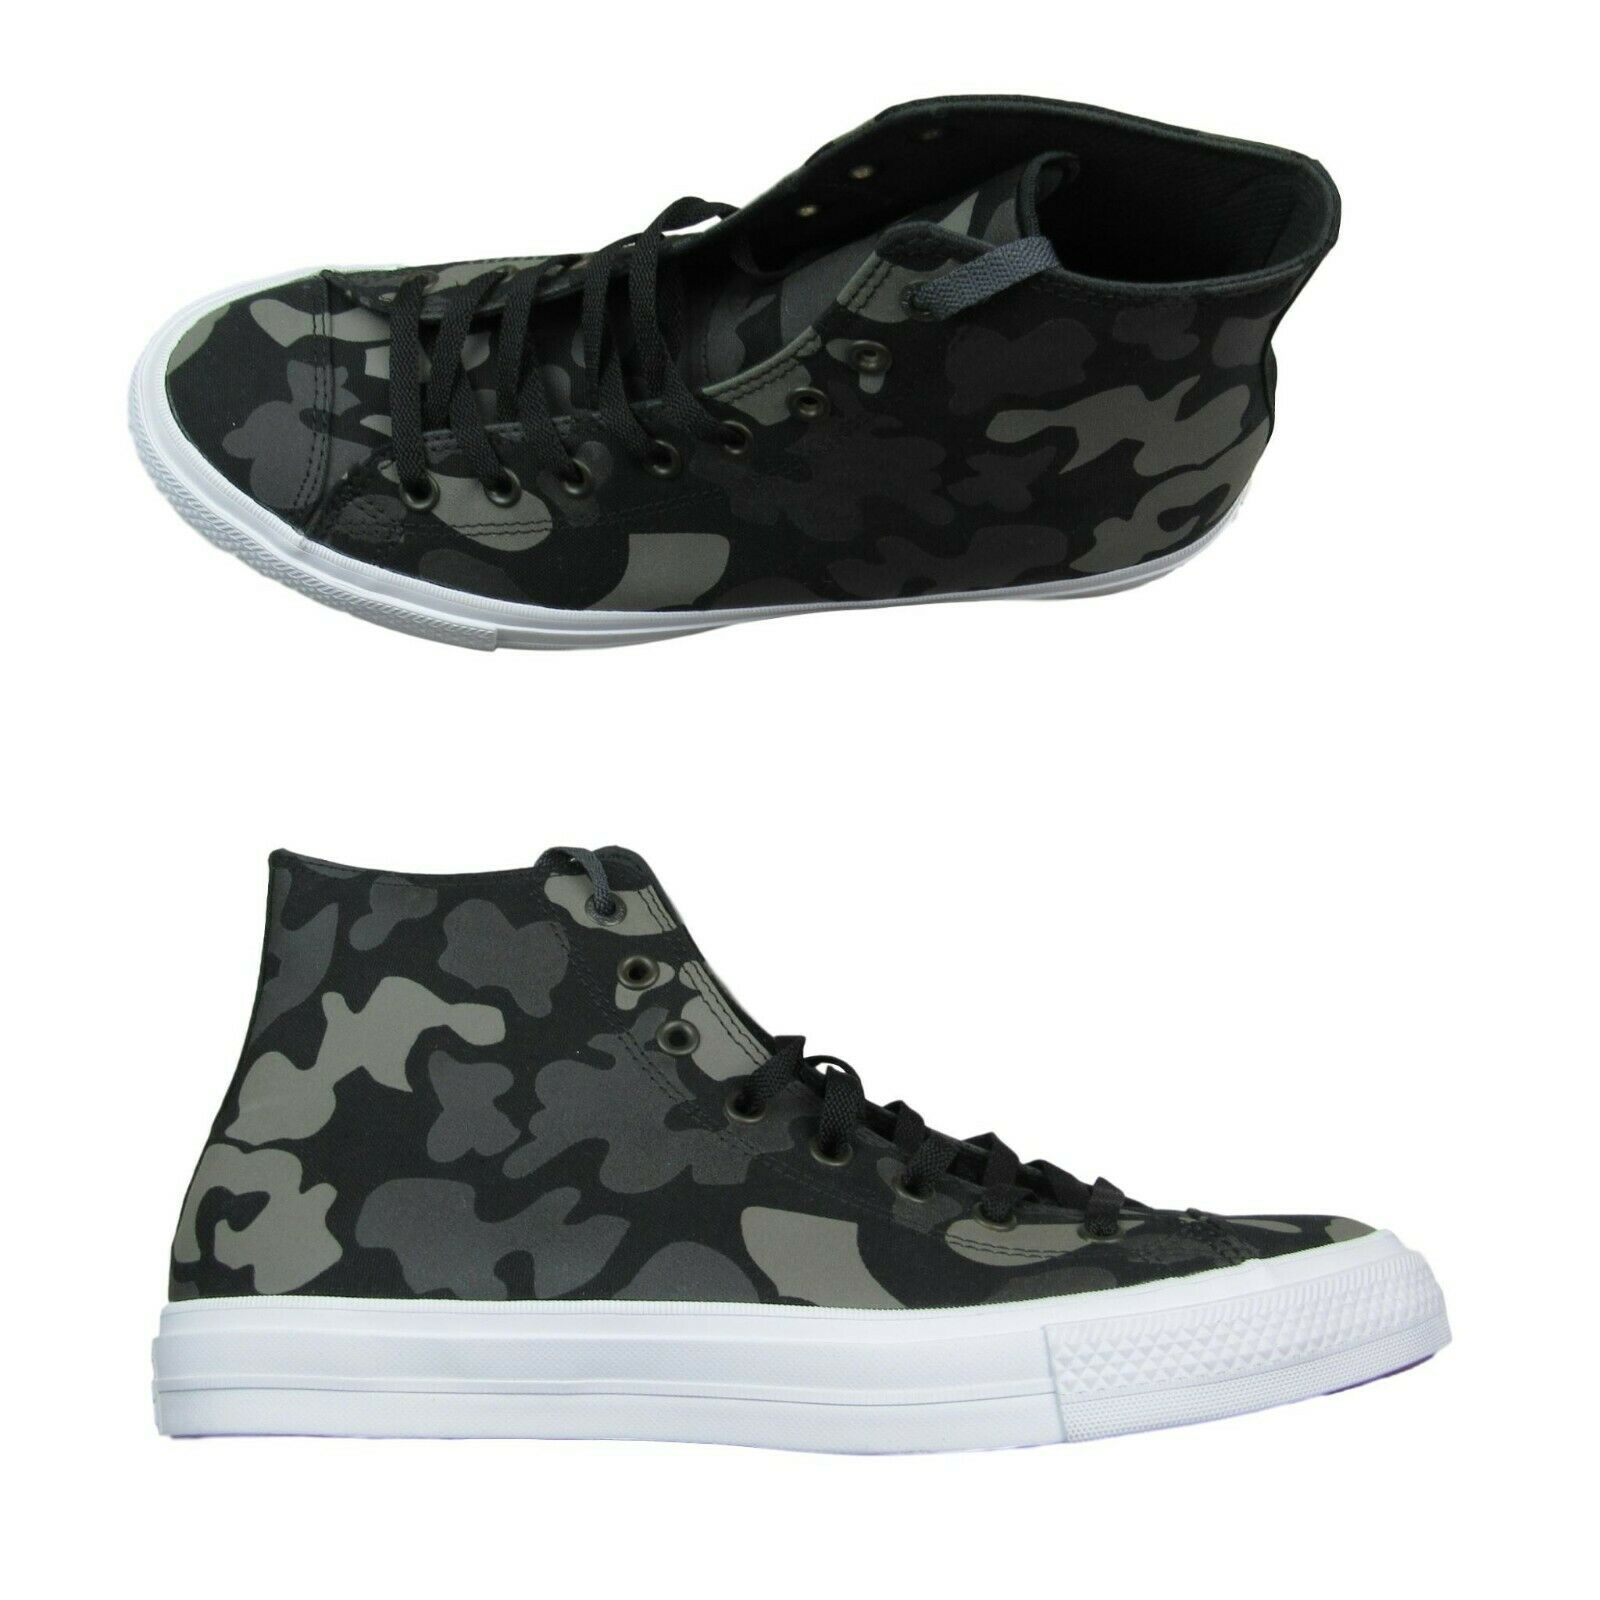 Converse Chuck Taylor All Star II Hi Talla 13 zapatos Charcoal Camo 151157C New